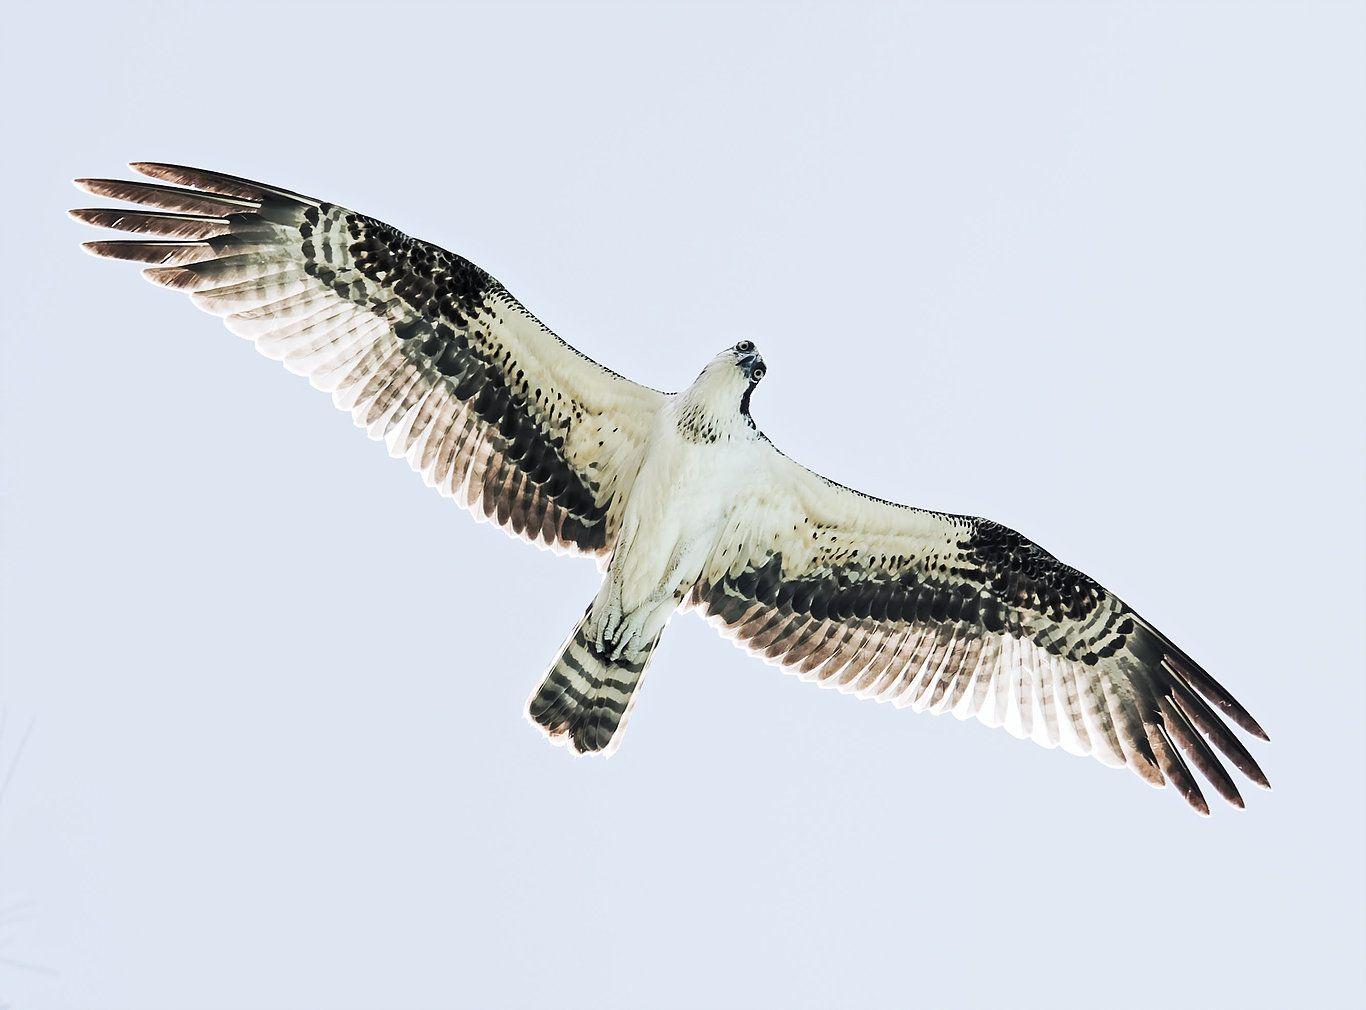 White and black bird flying overhead